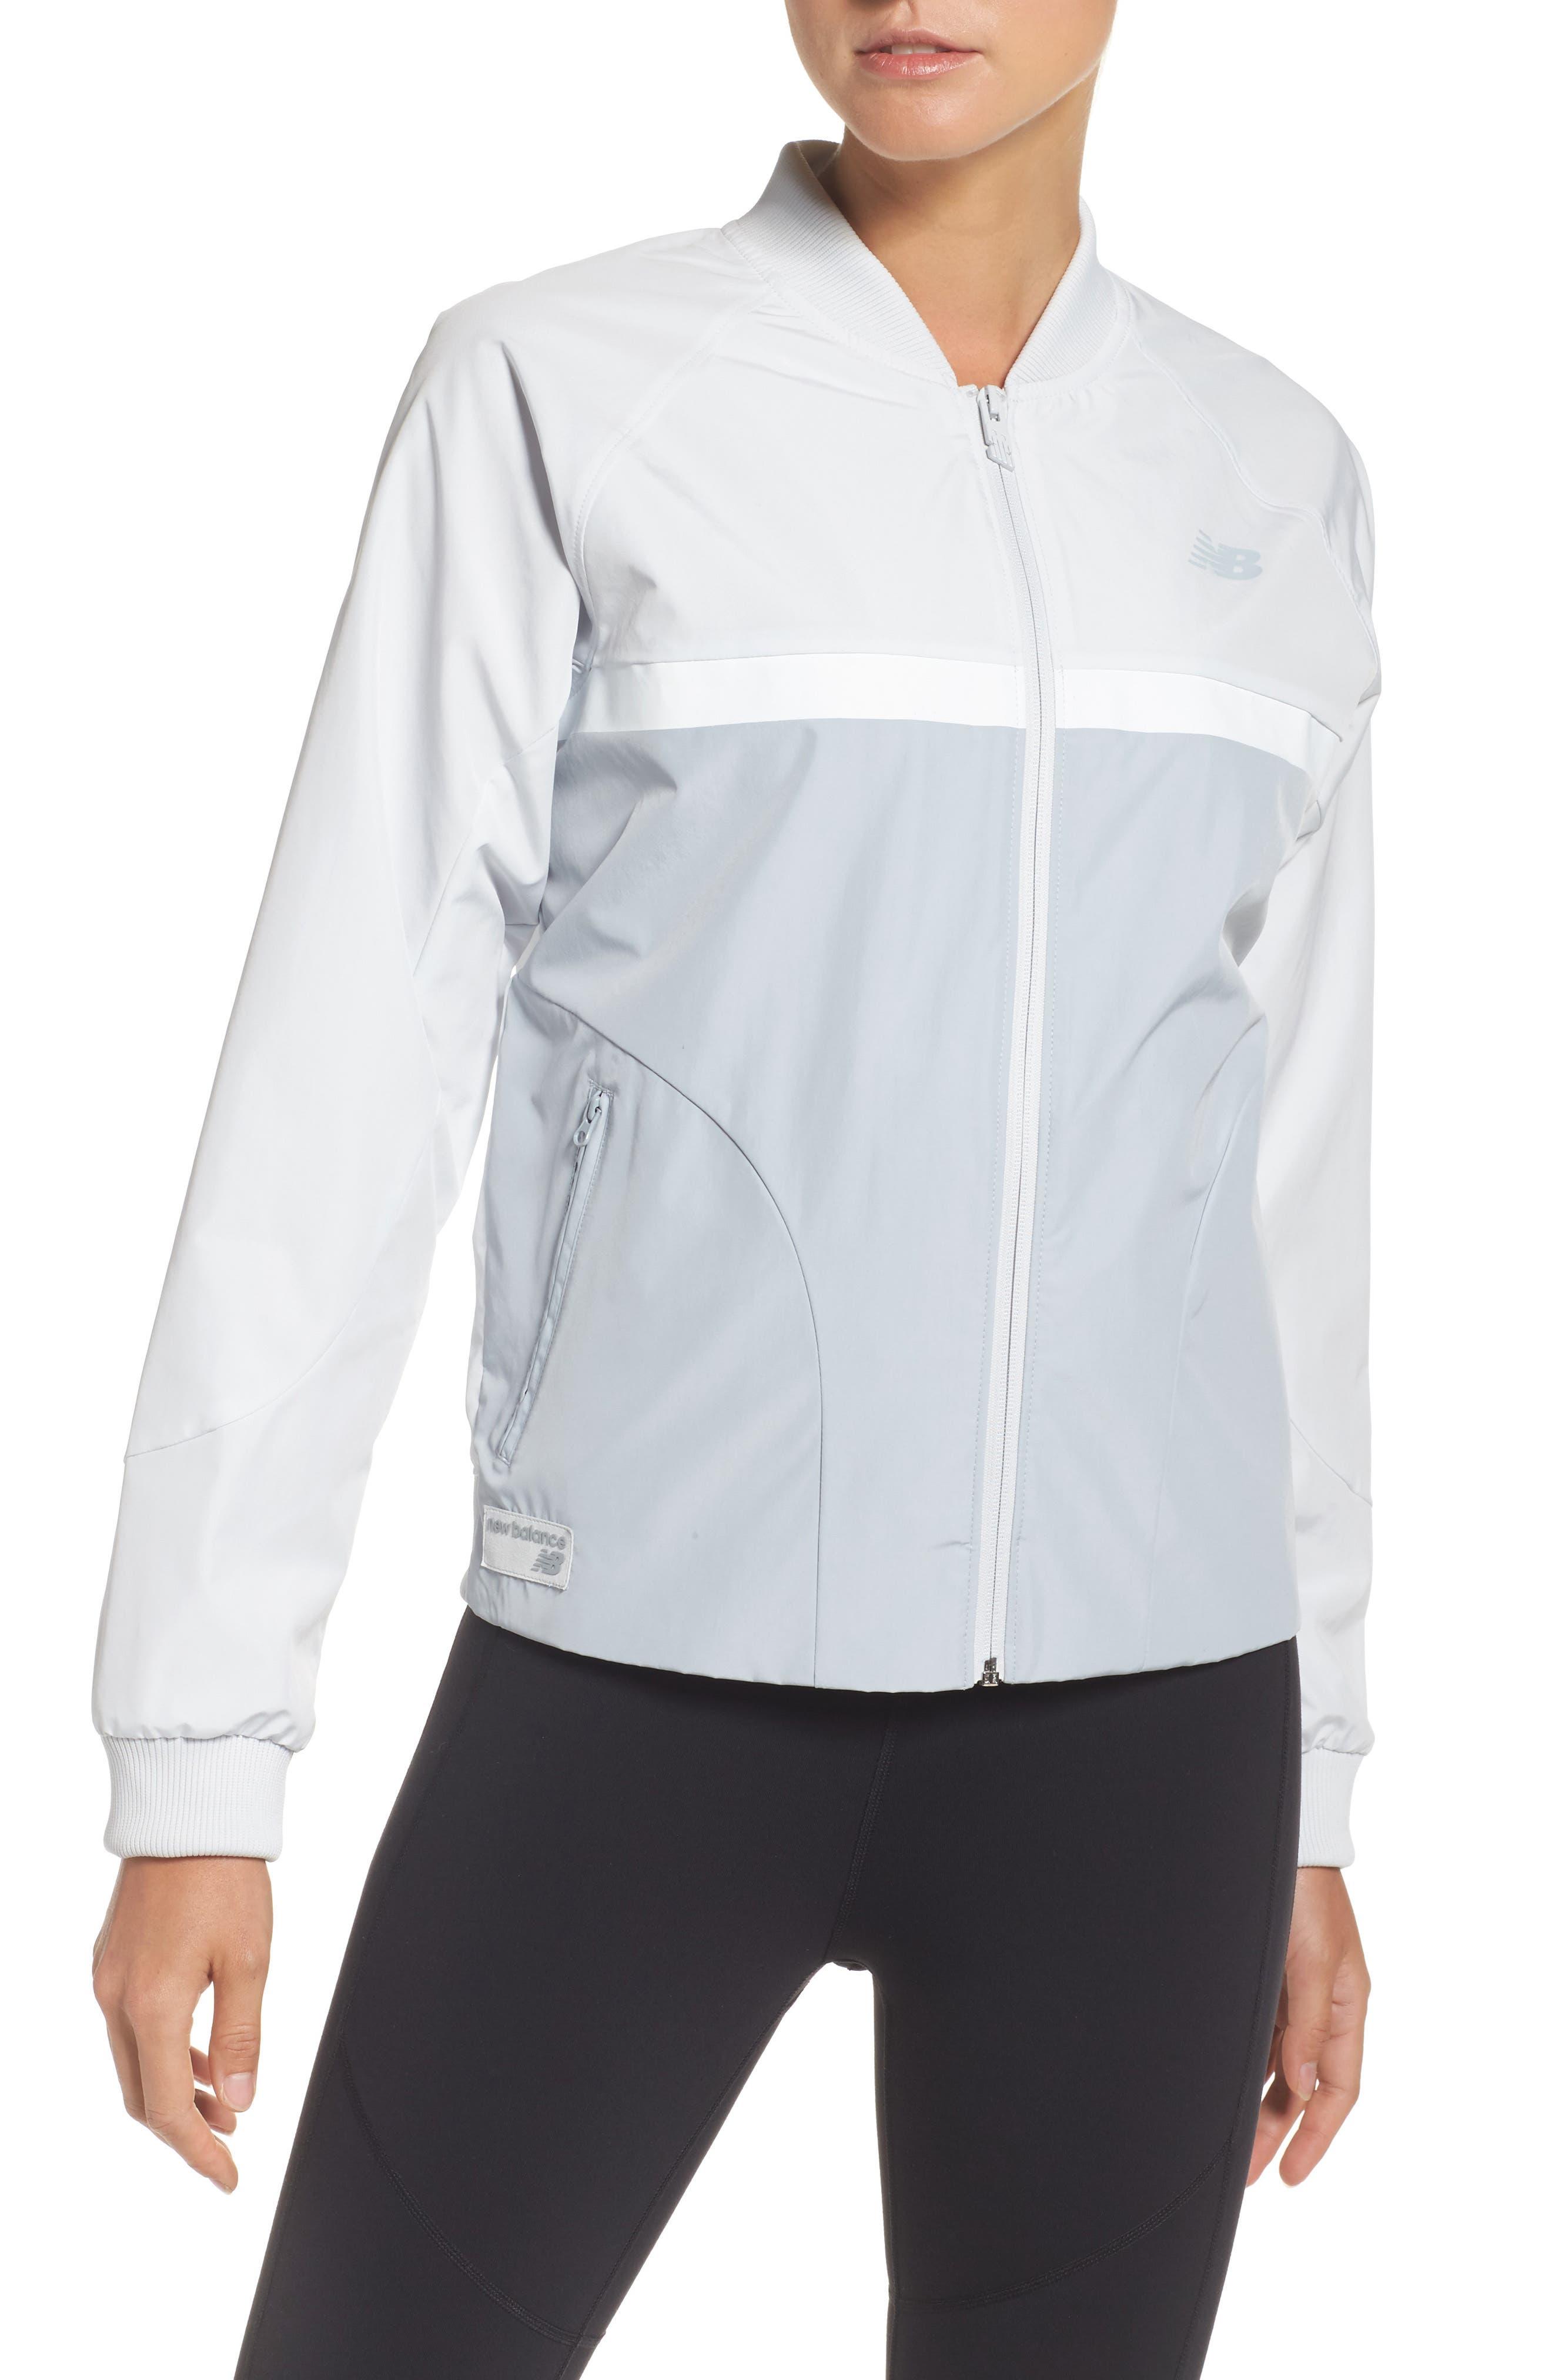 Windbreaker Jacket,                         Main,                         color, Arf